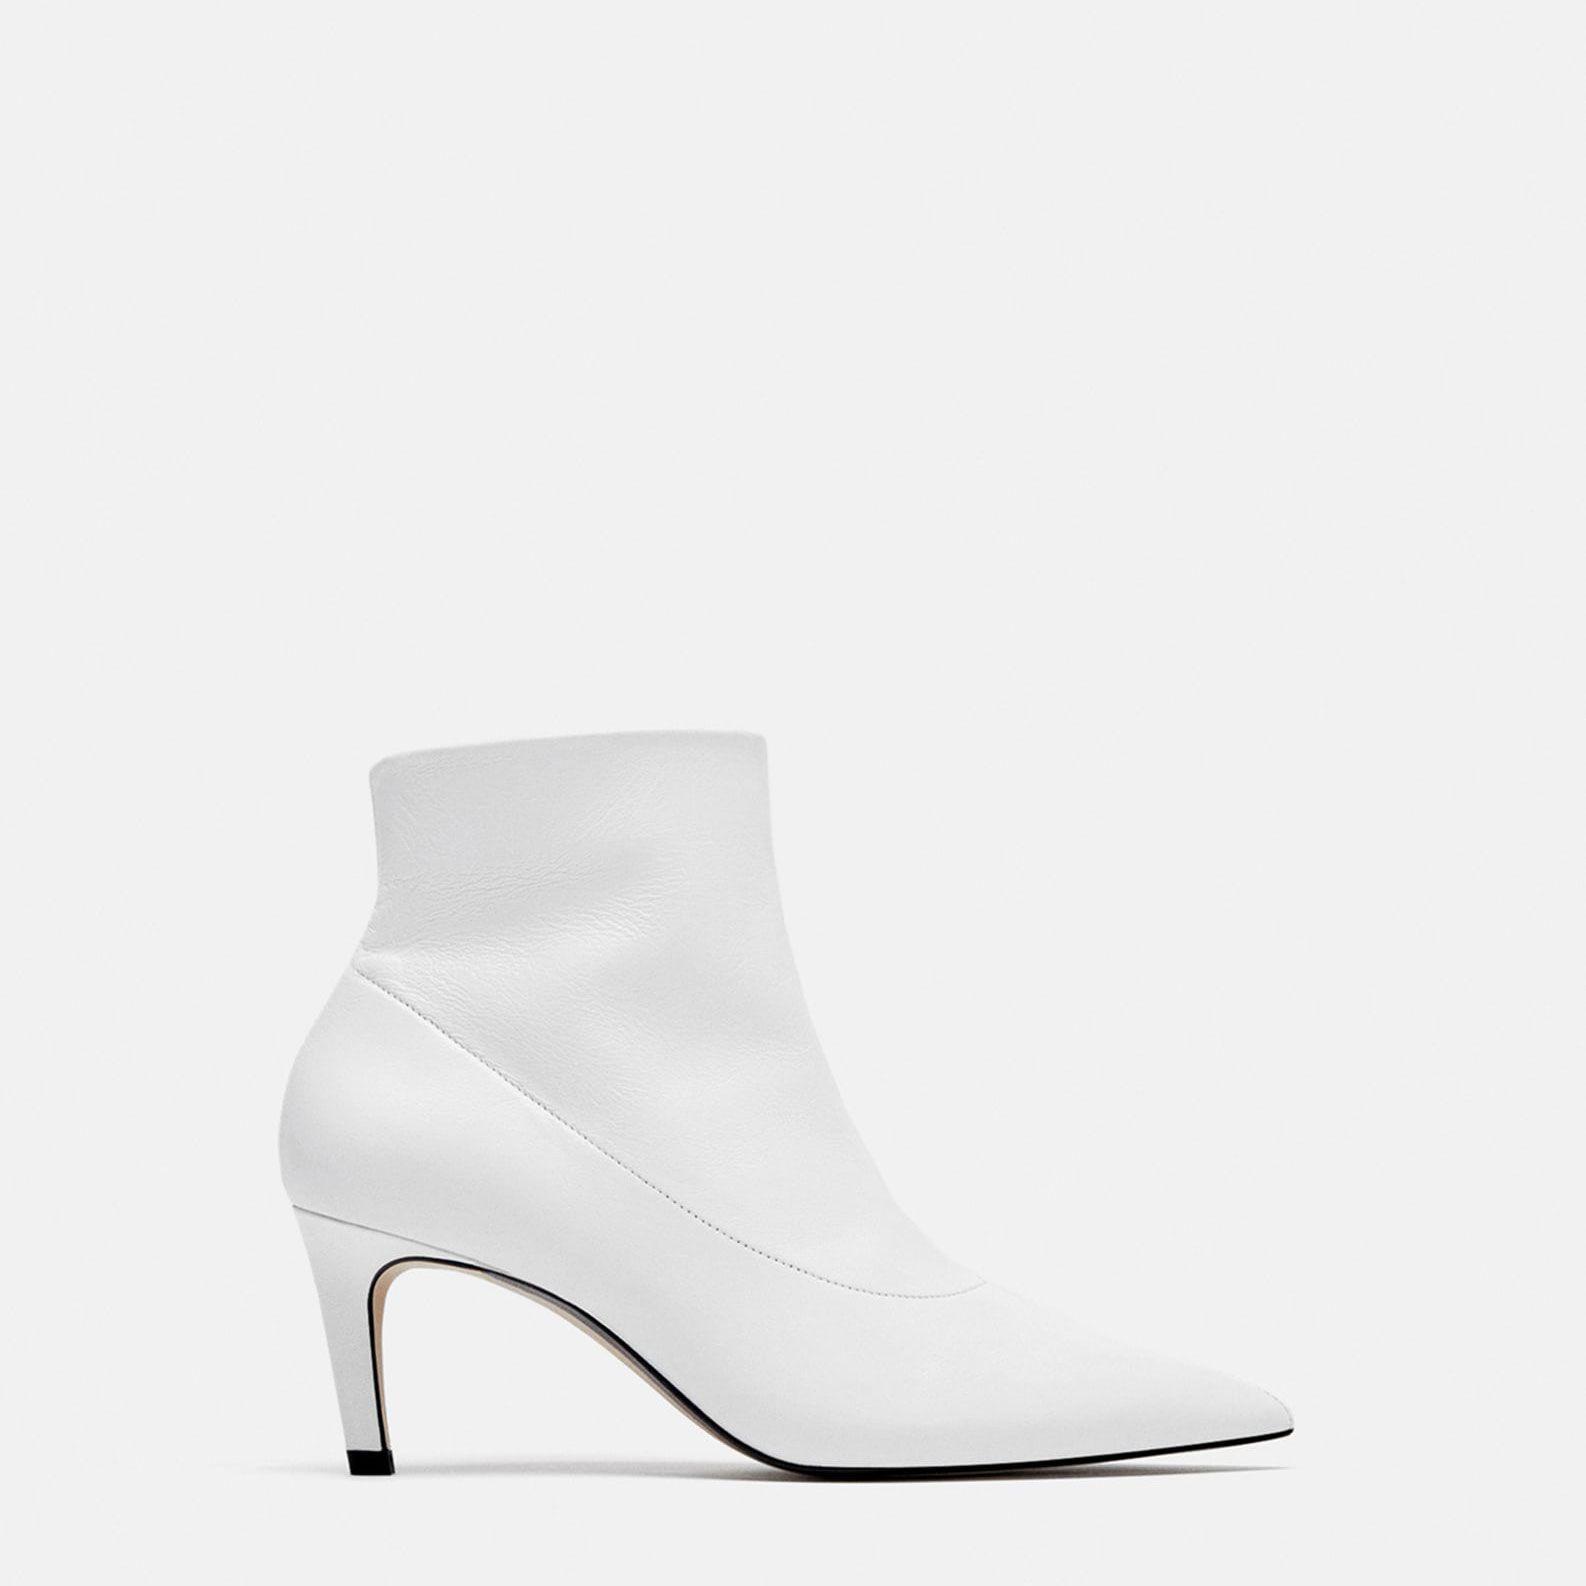 Botas blancas Zara